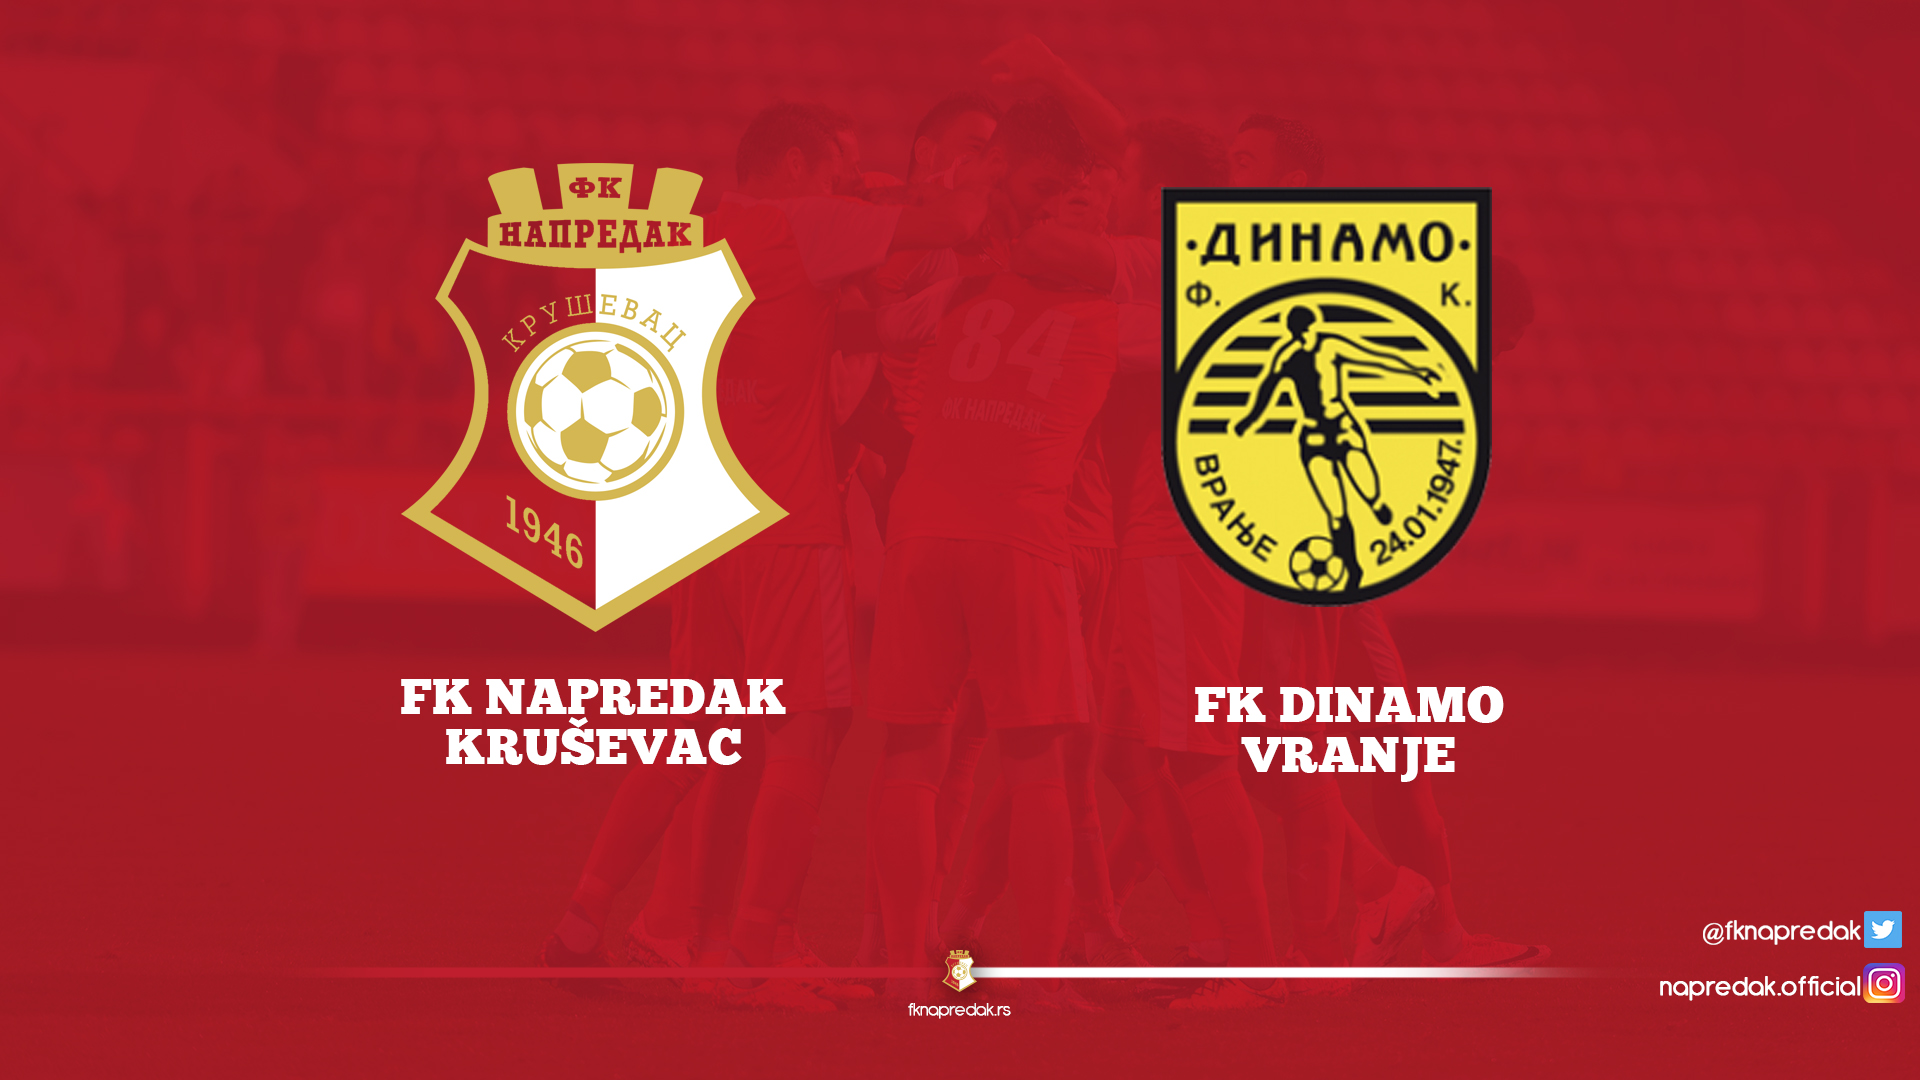 Napredak F.C. - Dinamo F.C. 3:0